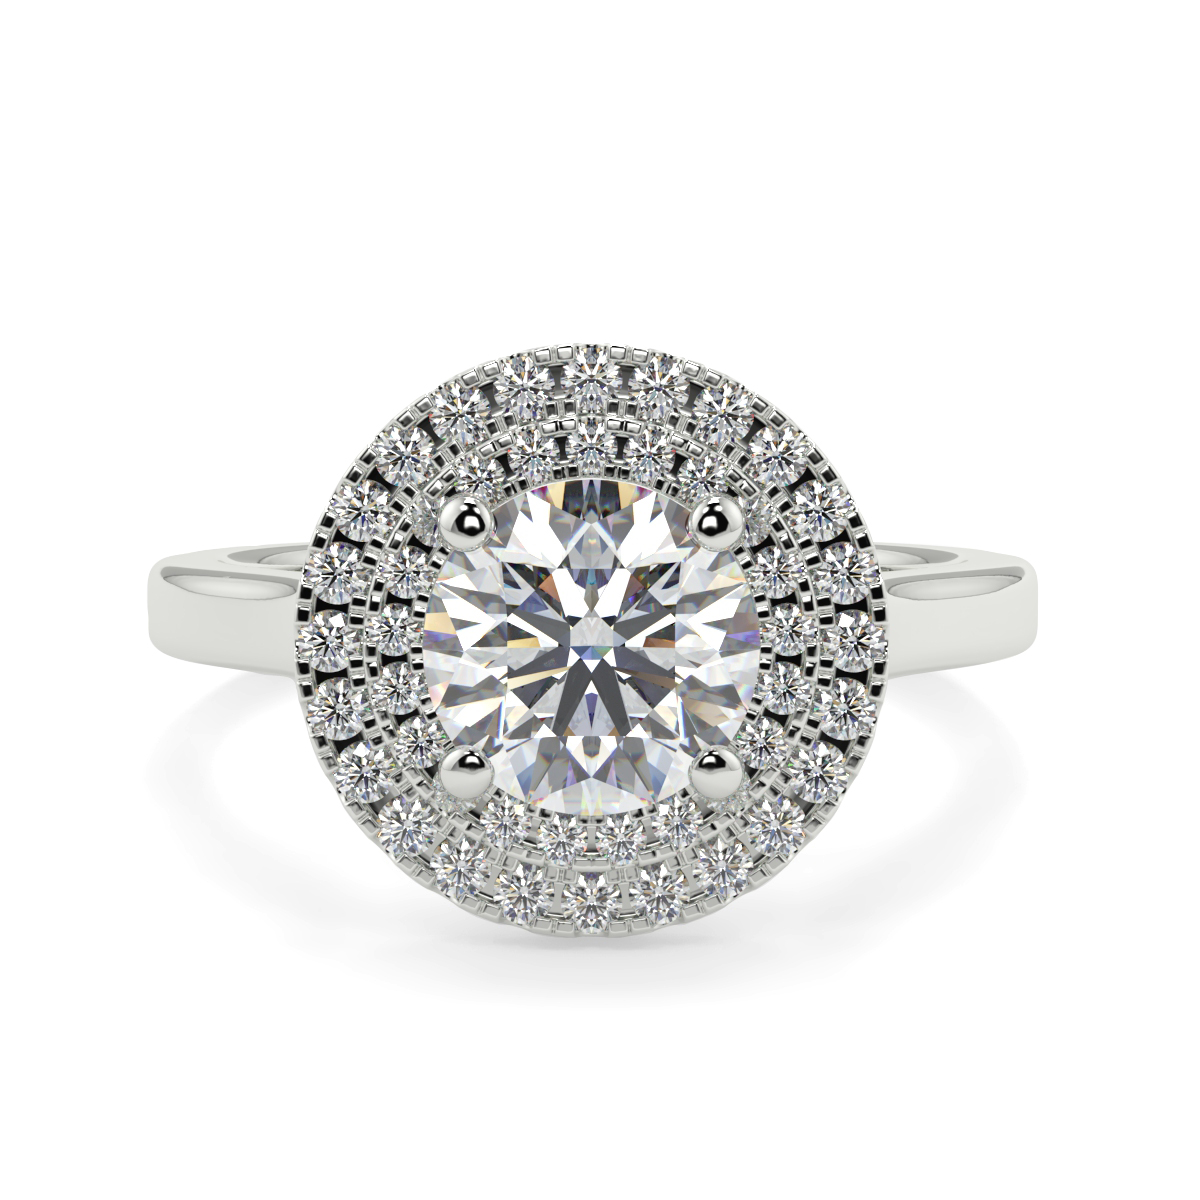 Round Double Halo Diamond Ring